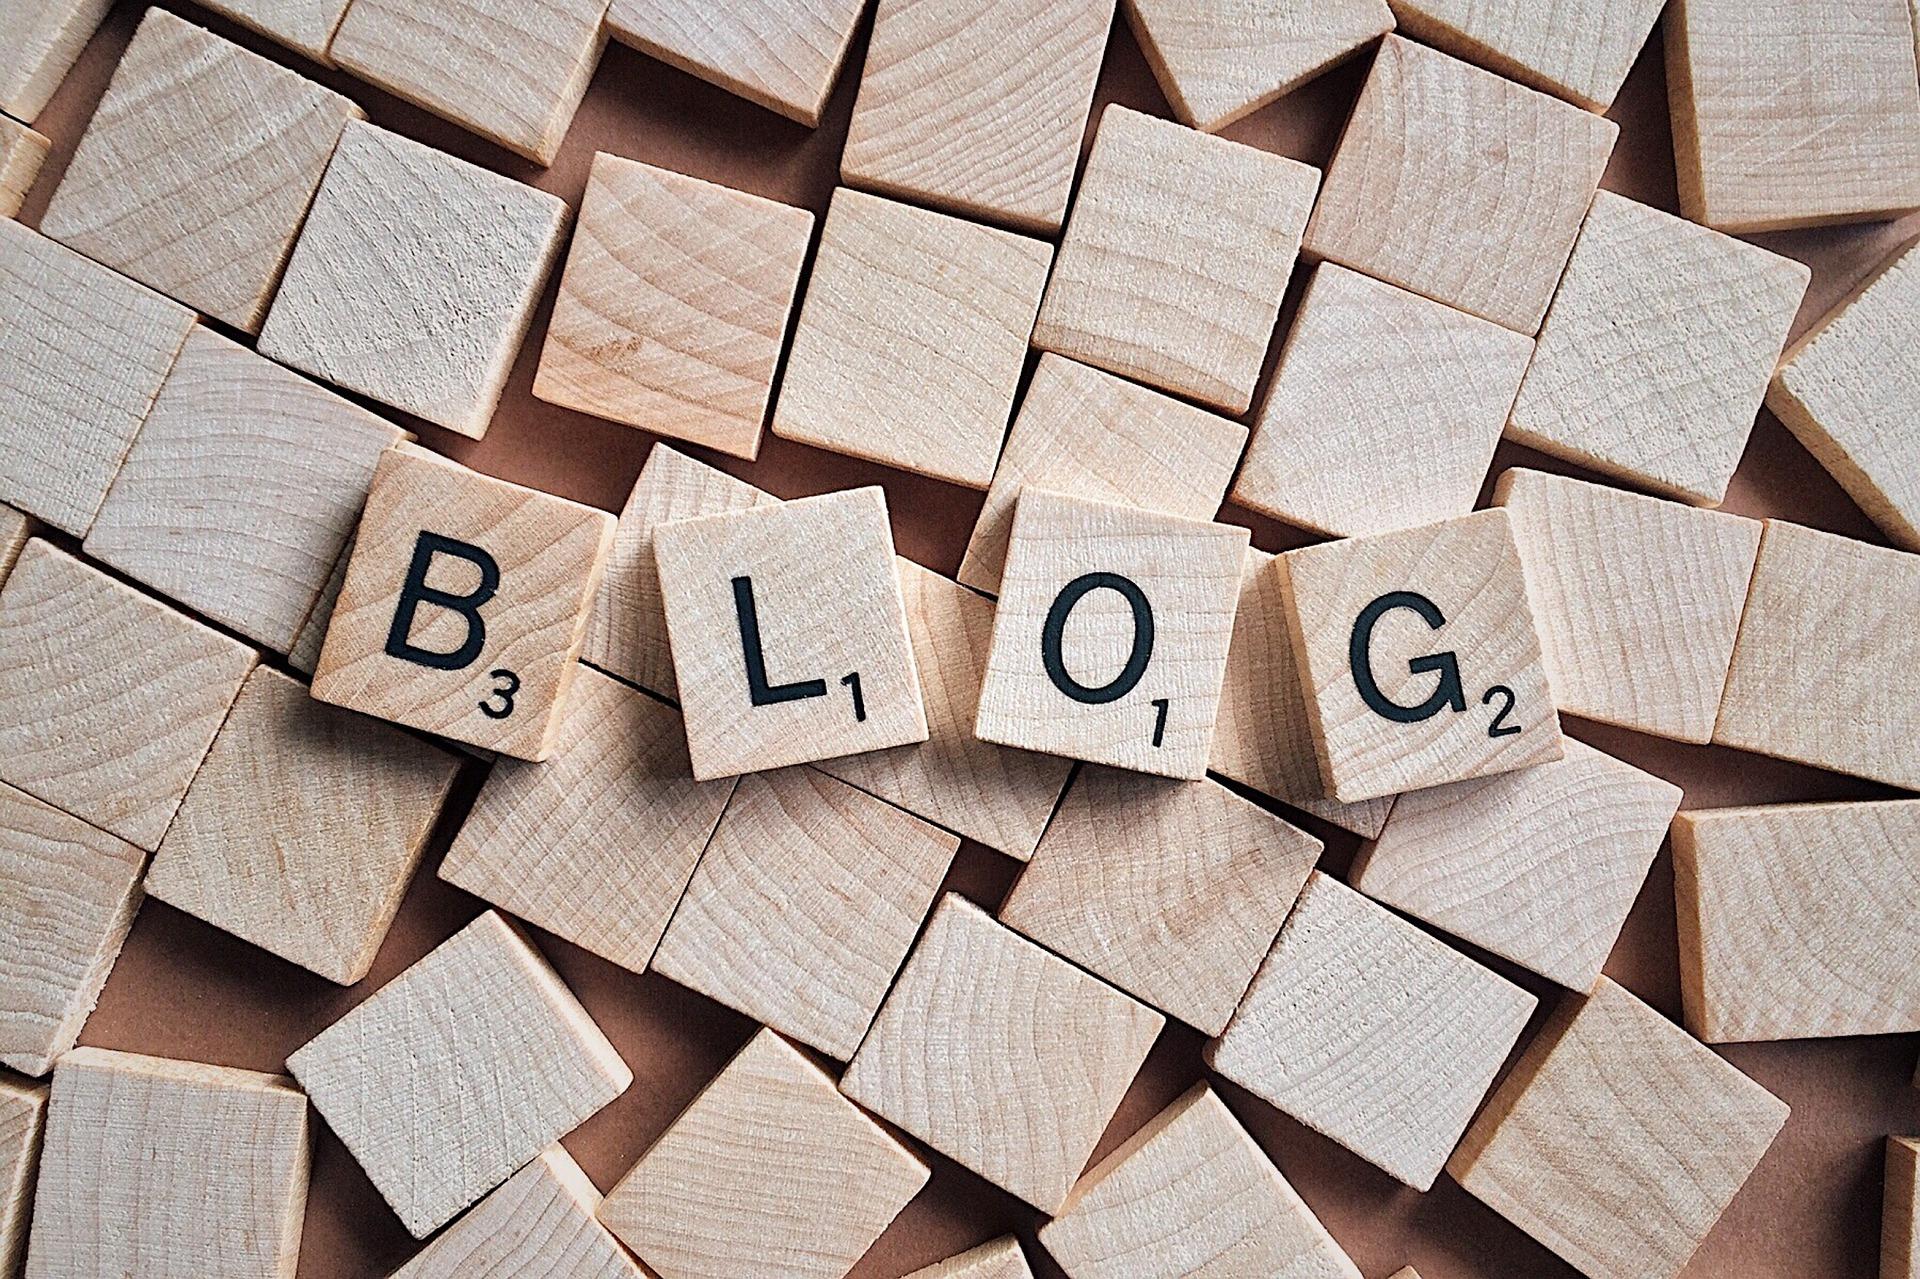 How to write a blog 3